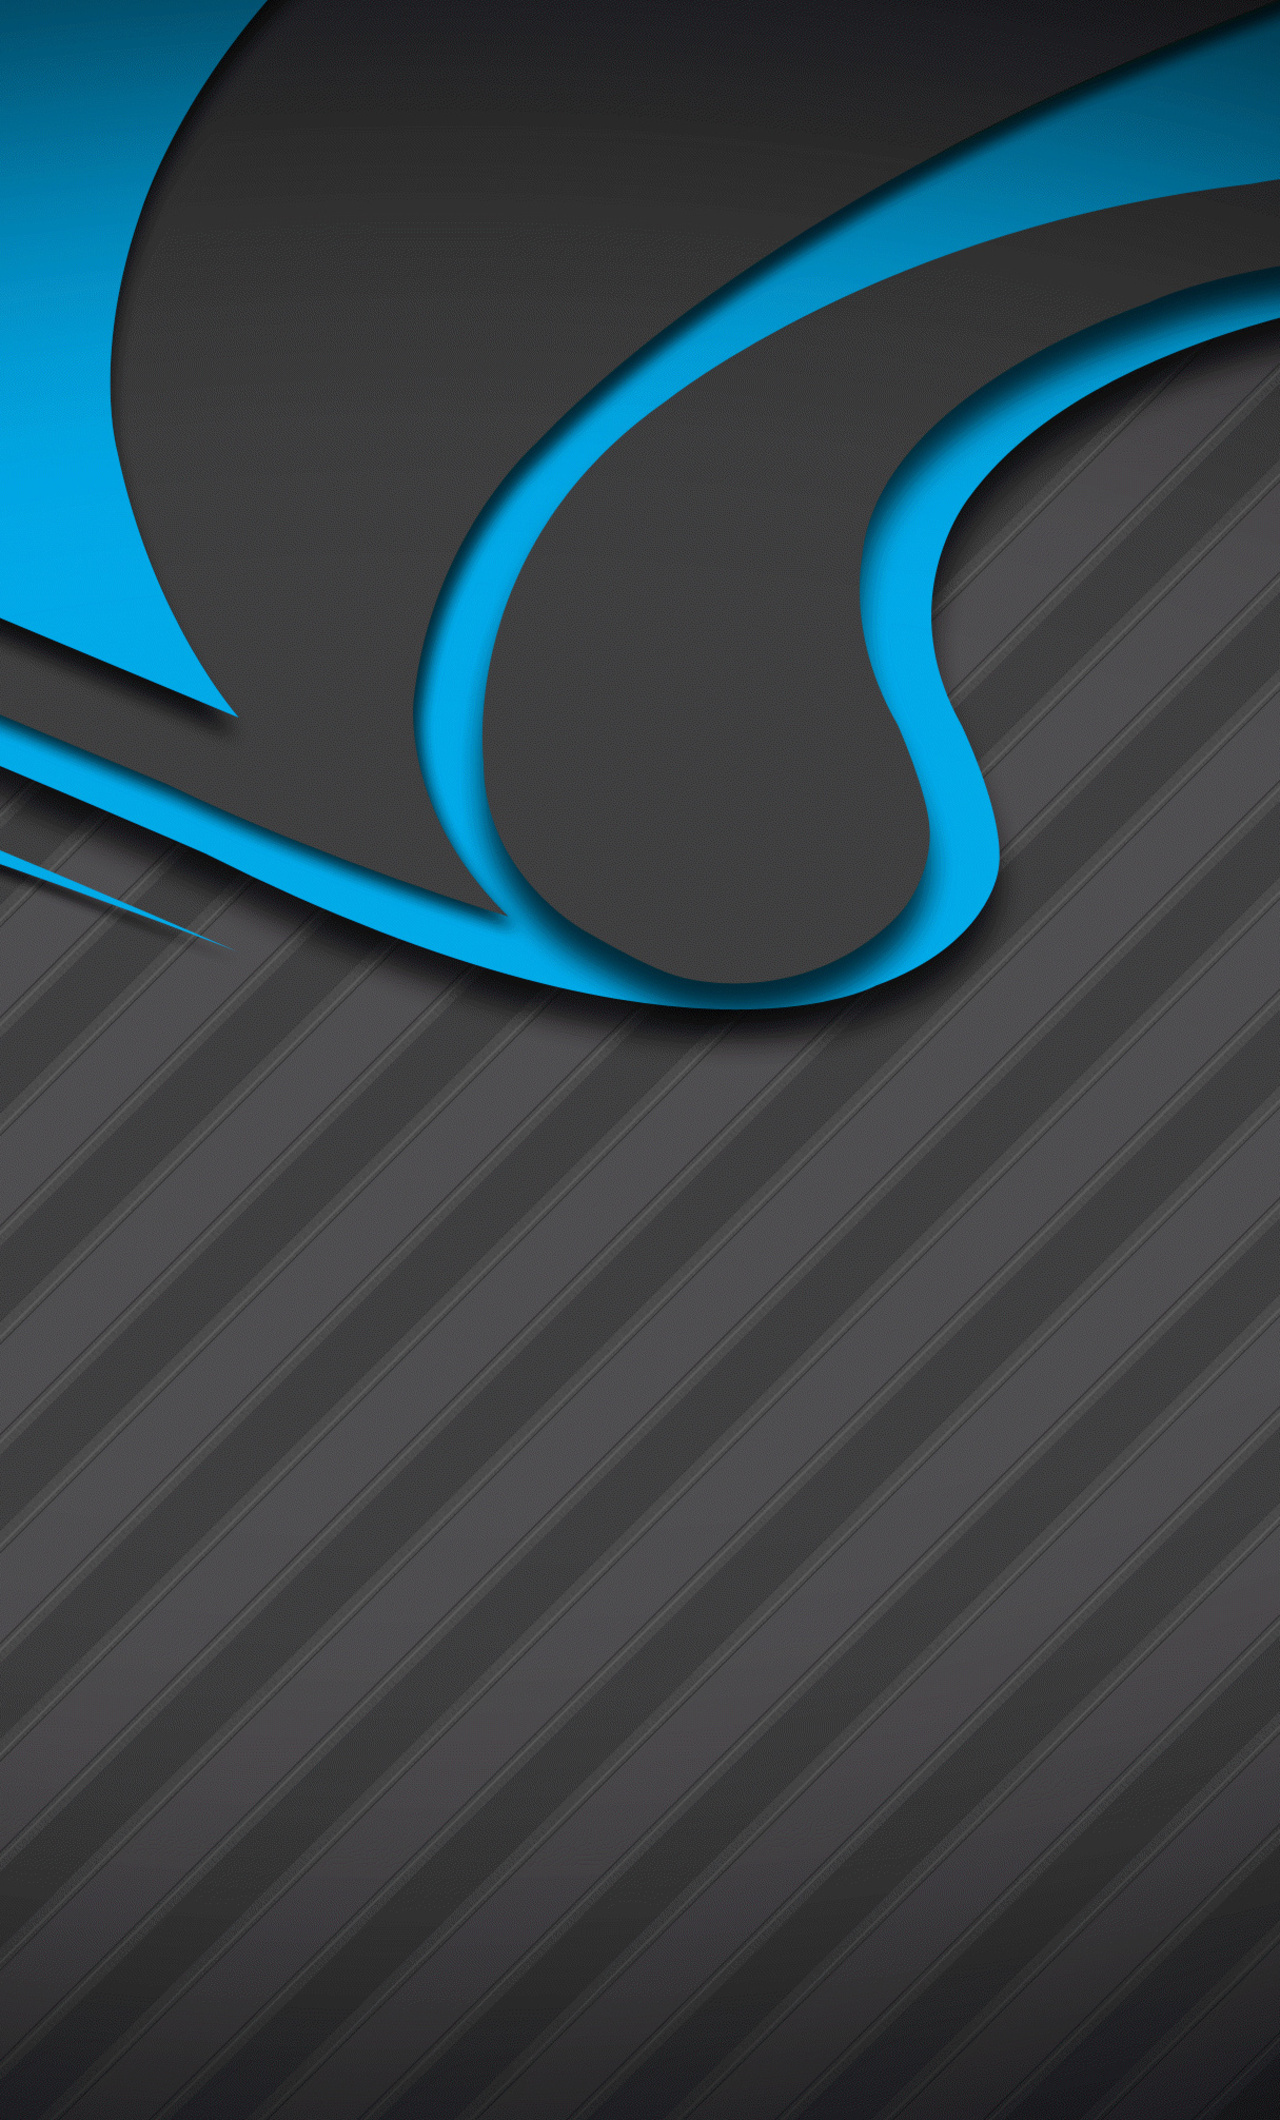 cyan-texture-blue-abstract-4k-ia.jpg